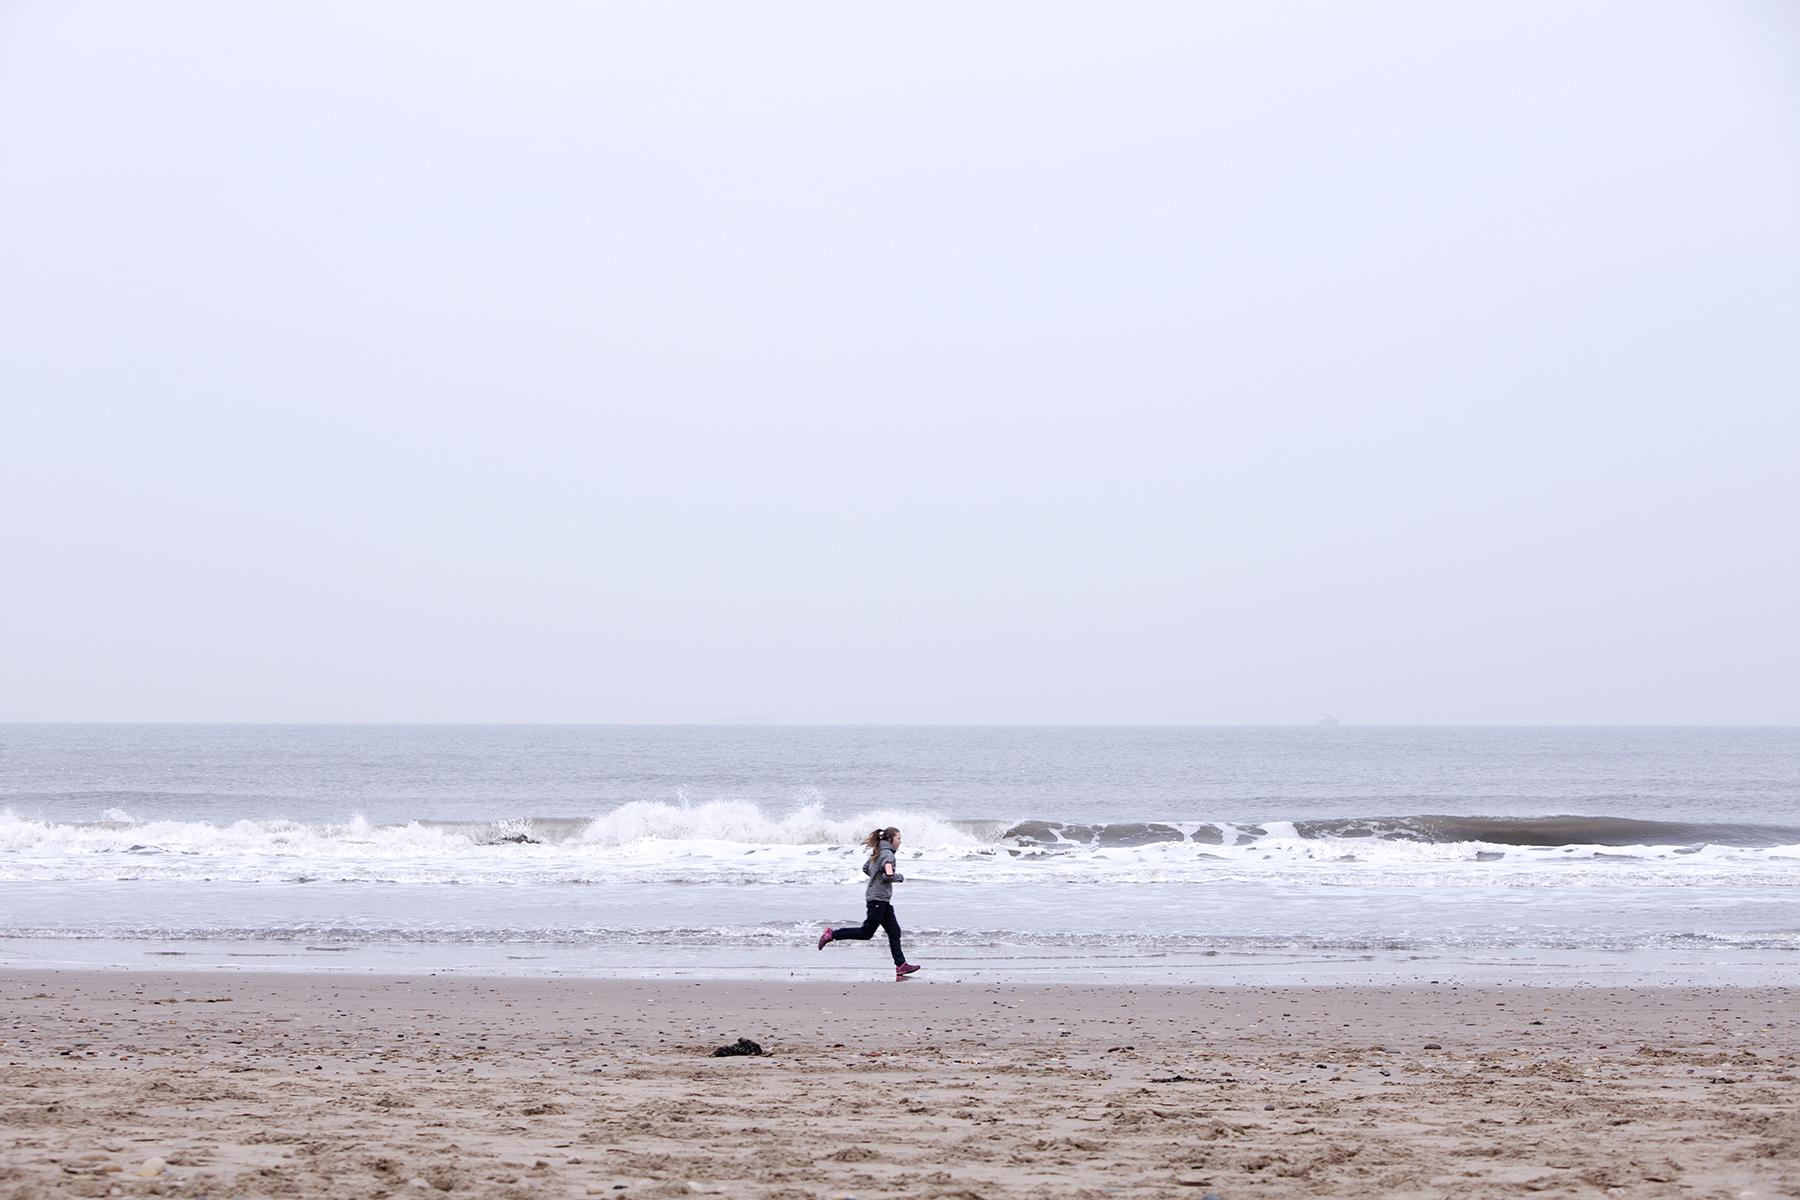 Dan Prince - Leigh Newton running on beach